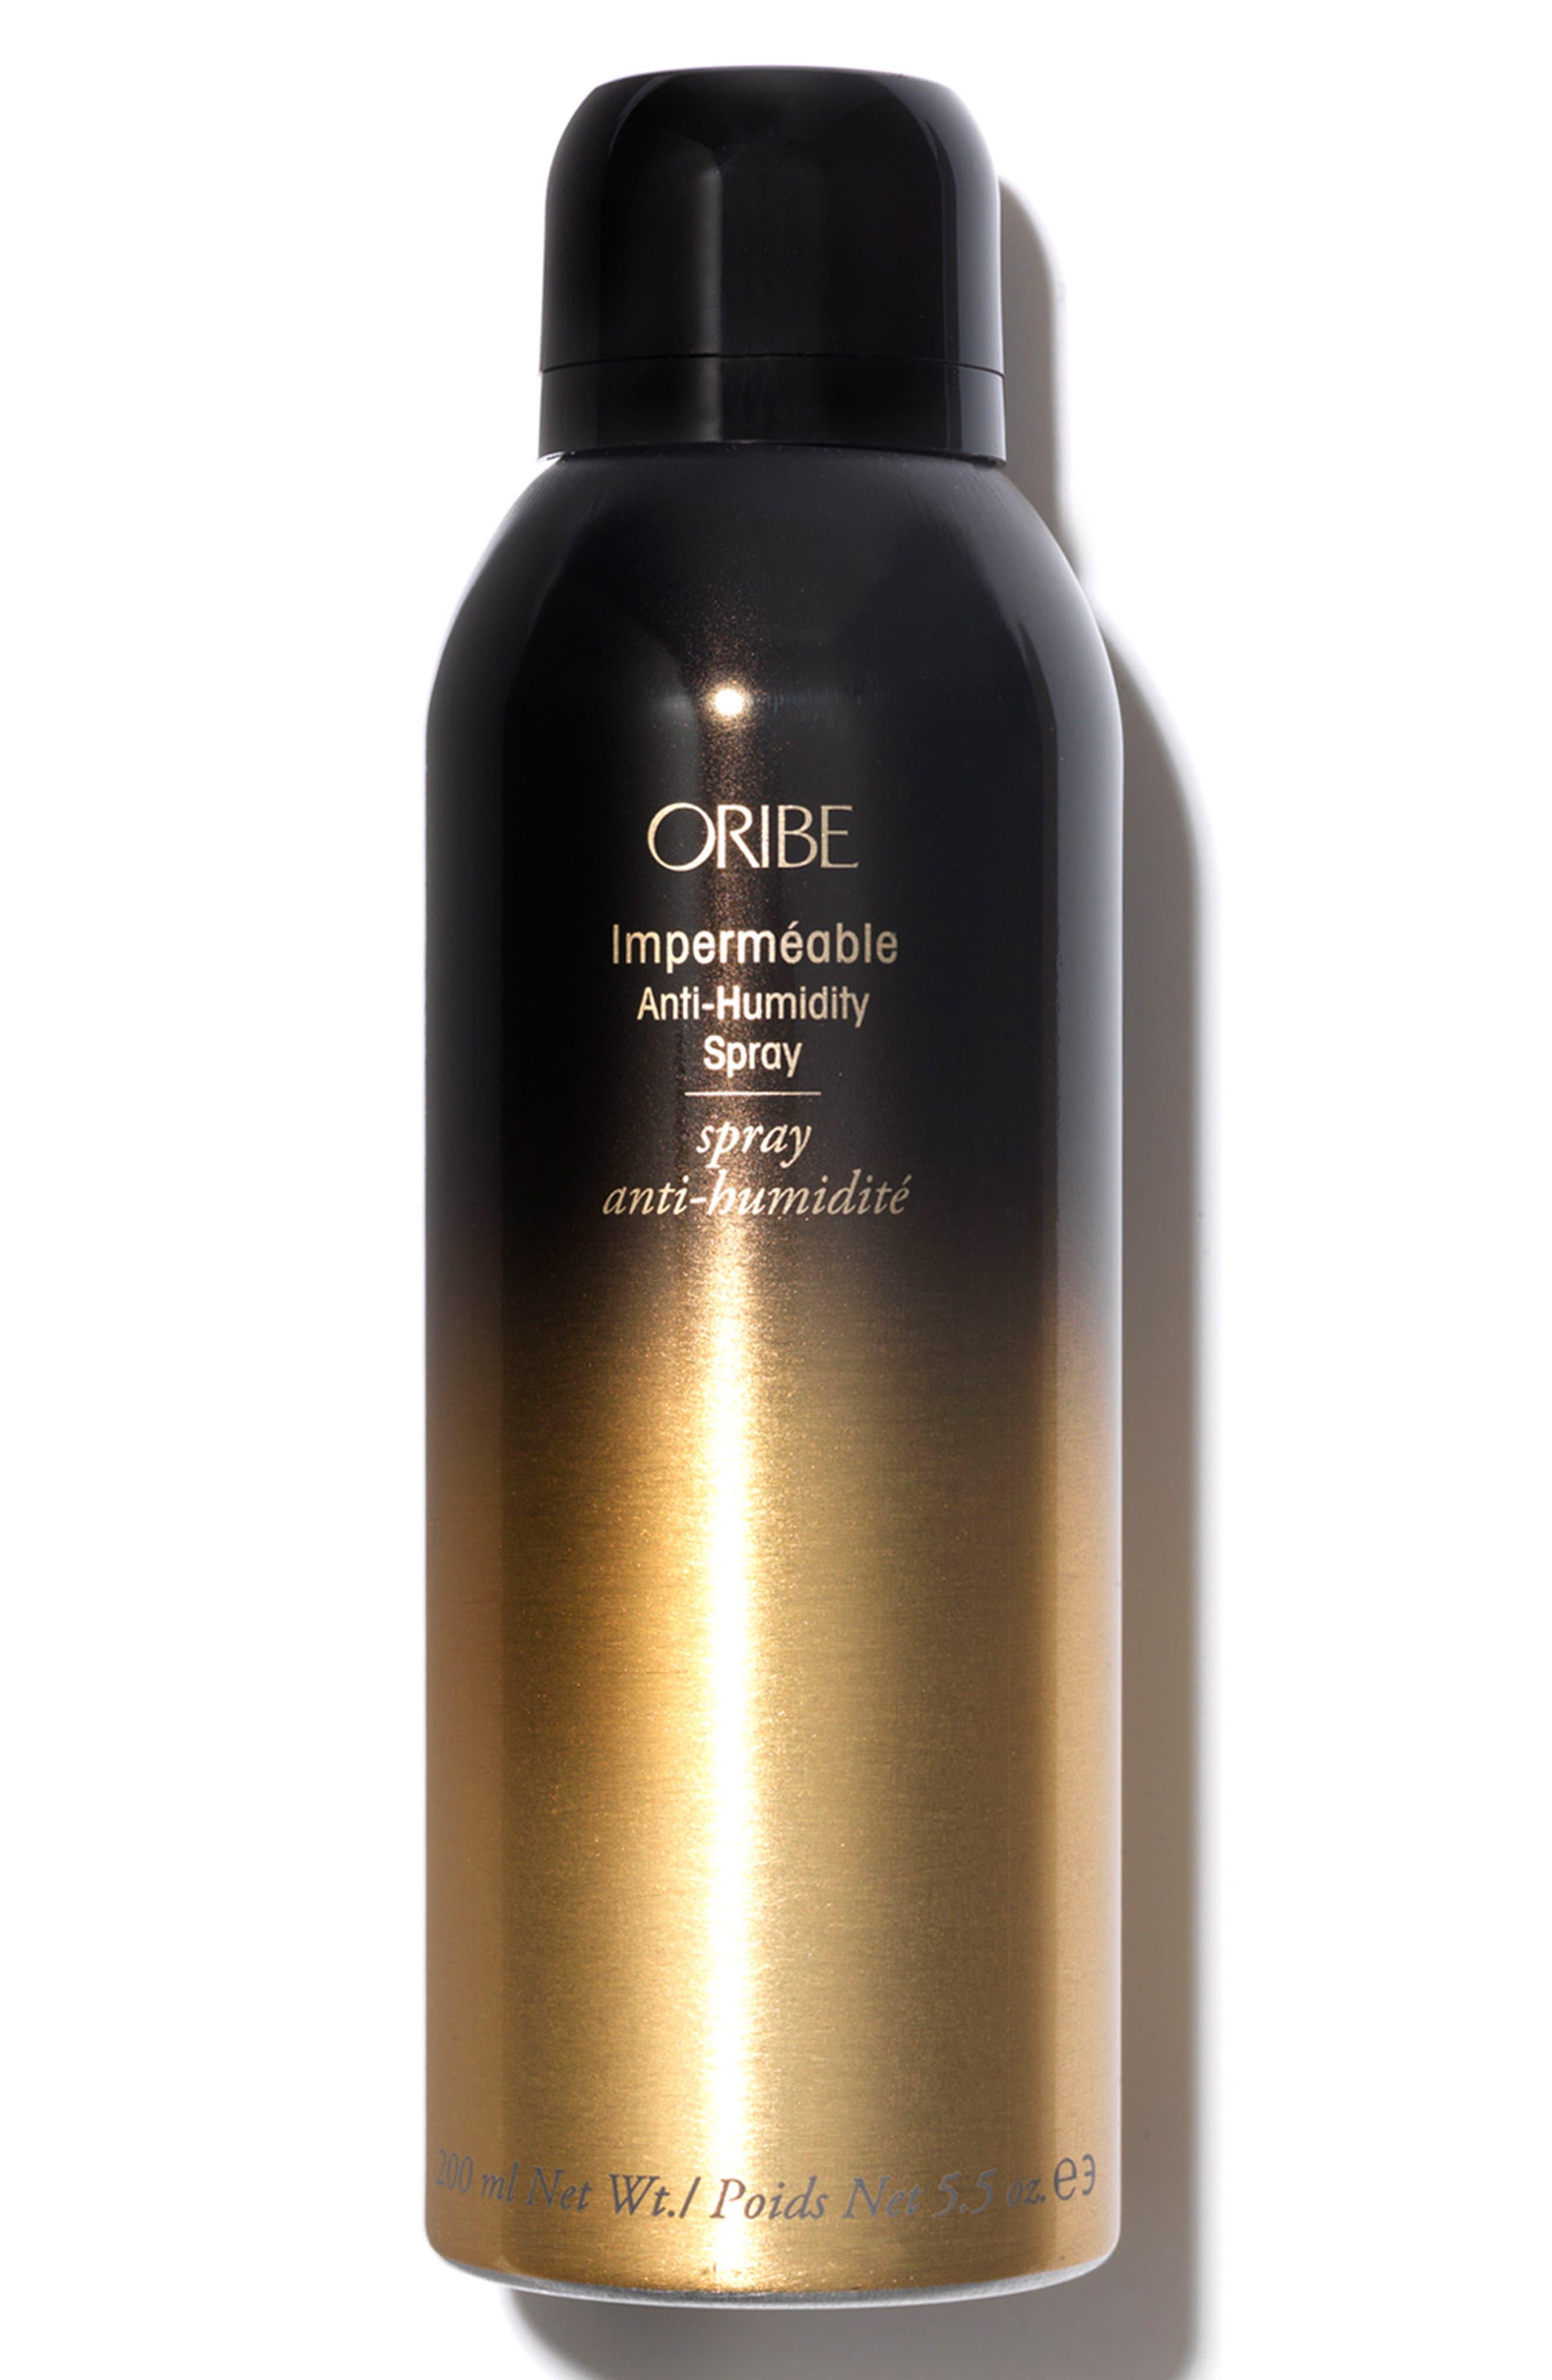 Impermeable Anti-Humid Spray